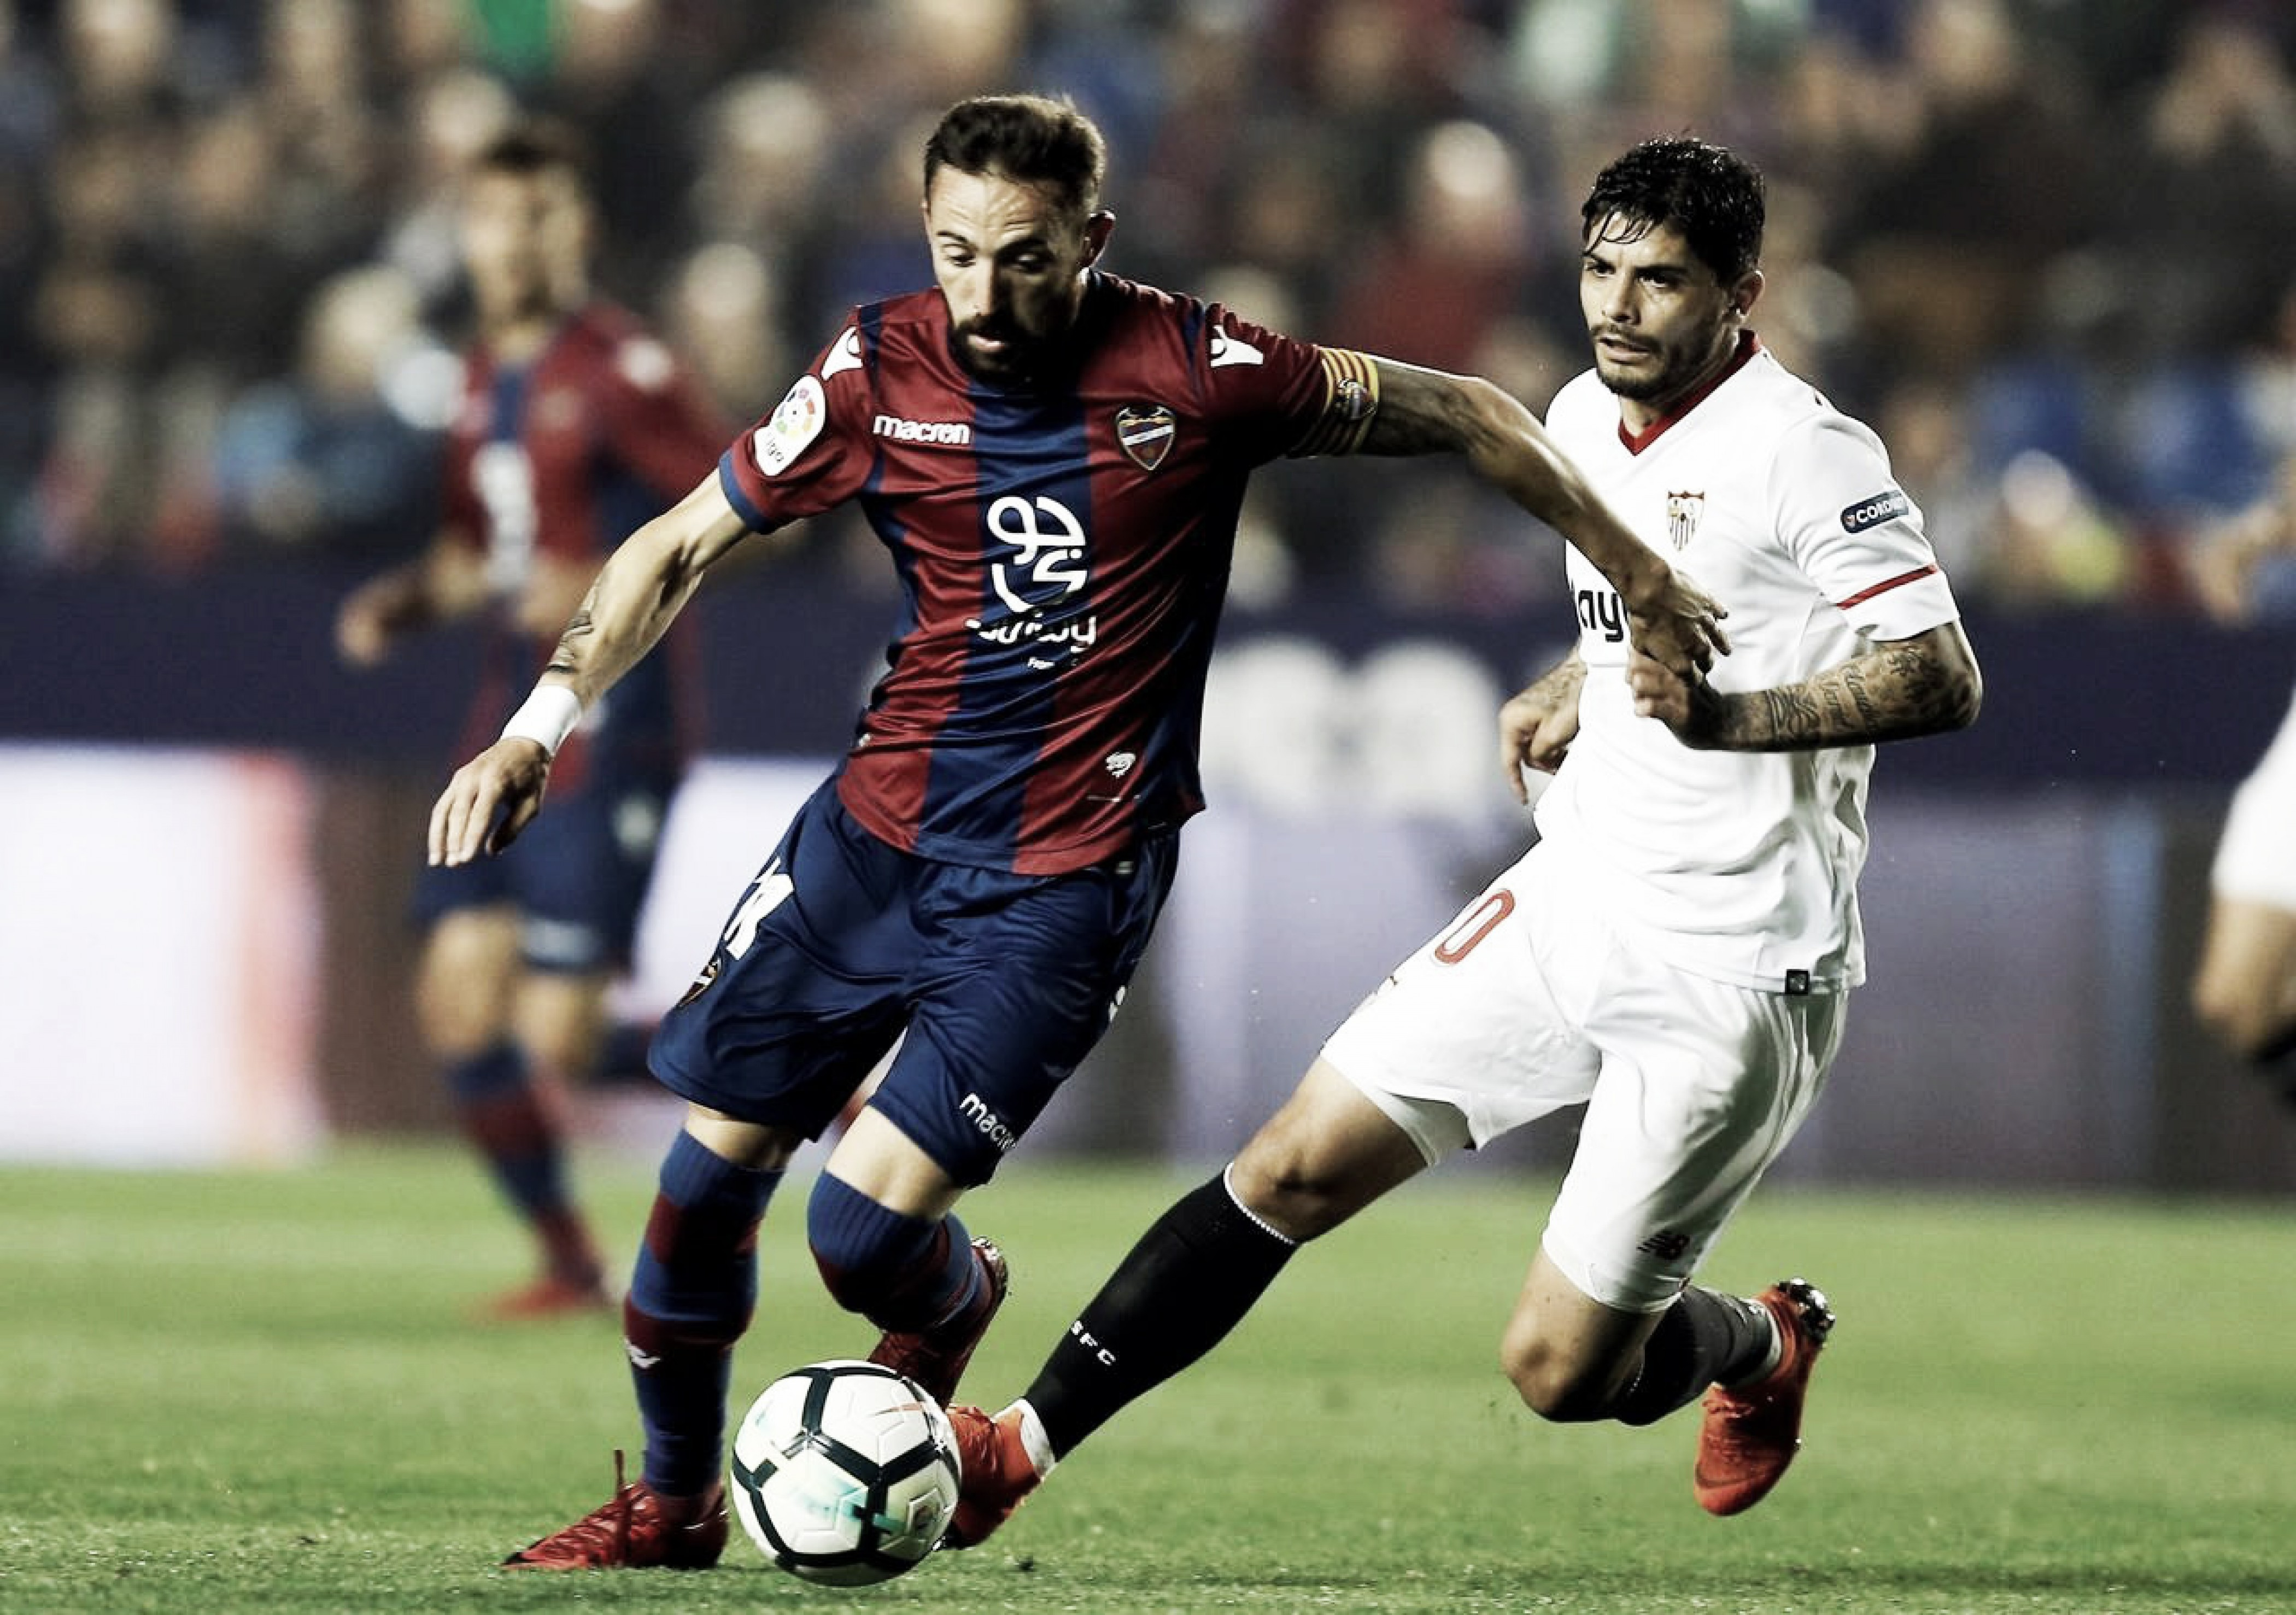 Previa Levante - Sevilla: a por la segunda victoria en Liga